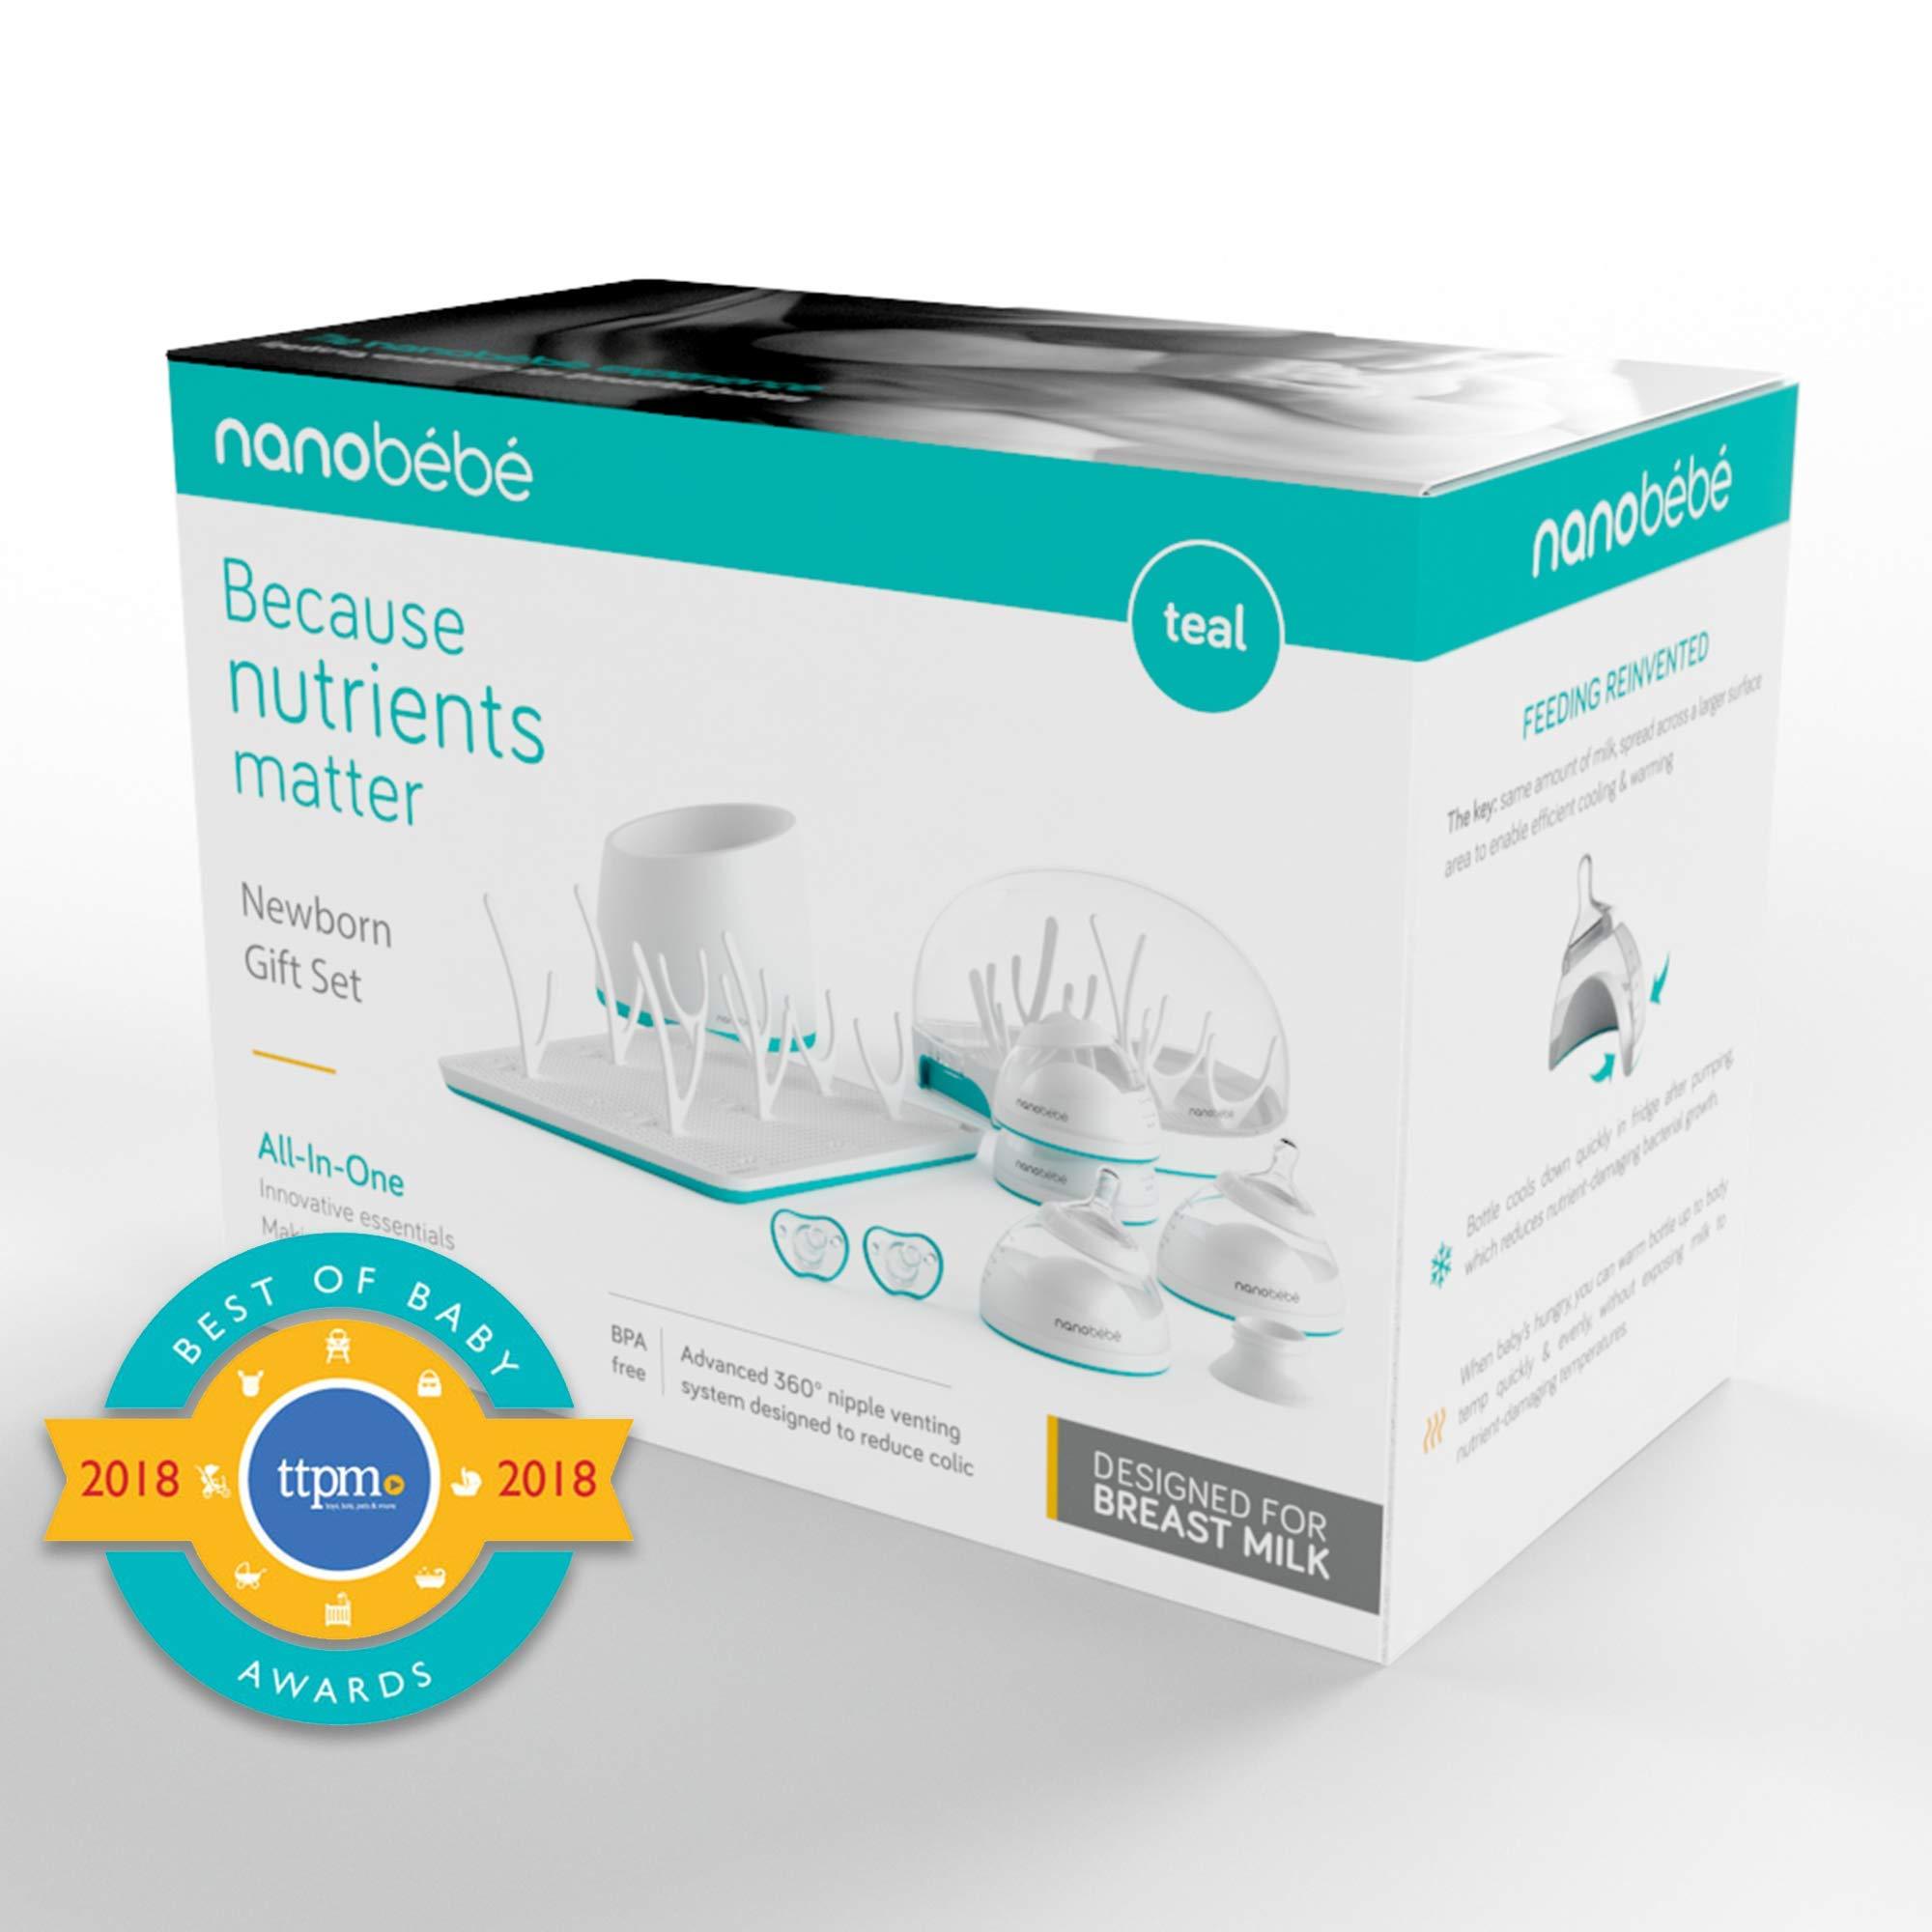 nanobébé Newborn Breastfeeding Bottles & Sterilization Kit – Anti Colic Baby Bottle Starter Set with Warming Bowl, Steam Sterilizer, Drying Rack, & Pacifiers – Top Registry Gift Set by NANOBÉBÉ (Image #2)